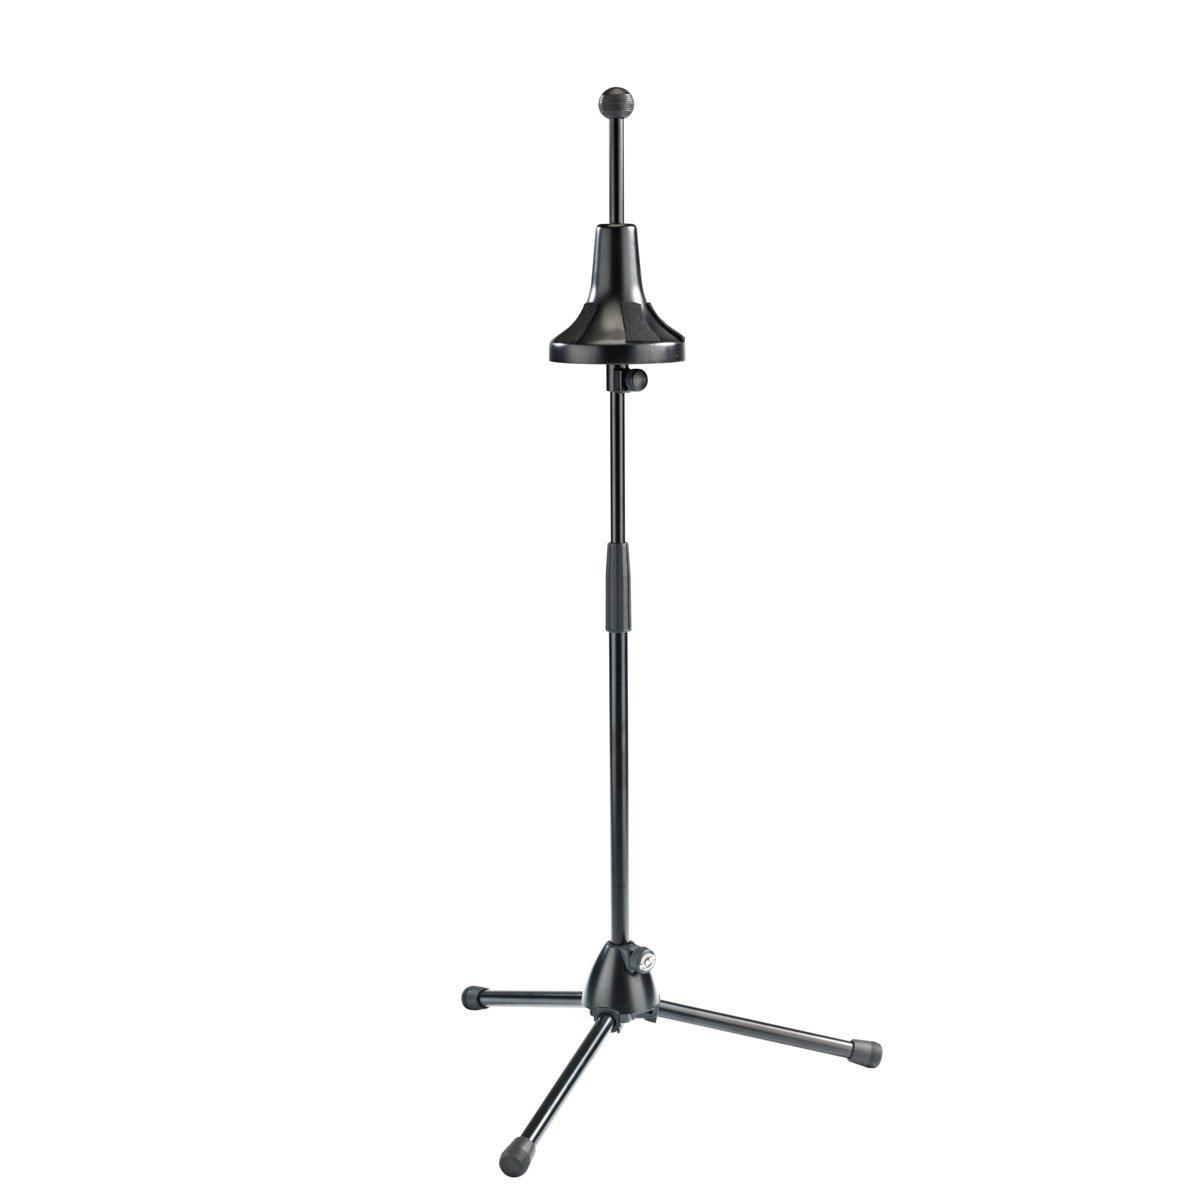 Bass Trombone Stand (Black)